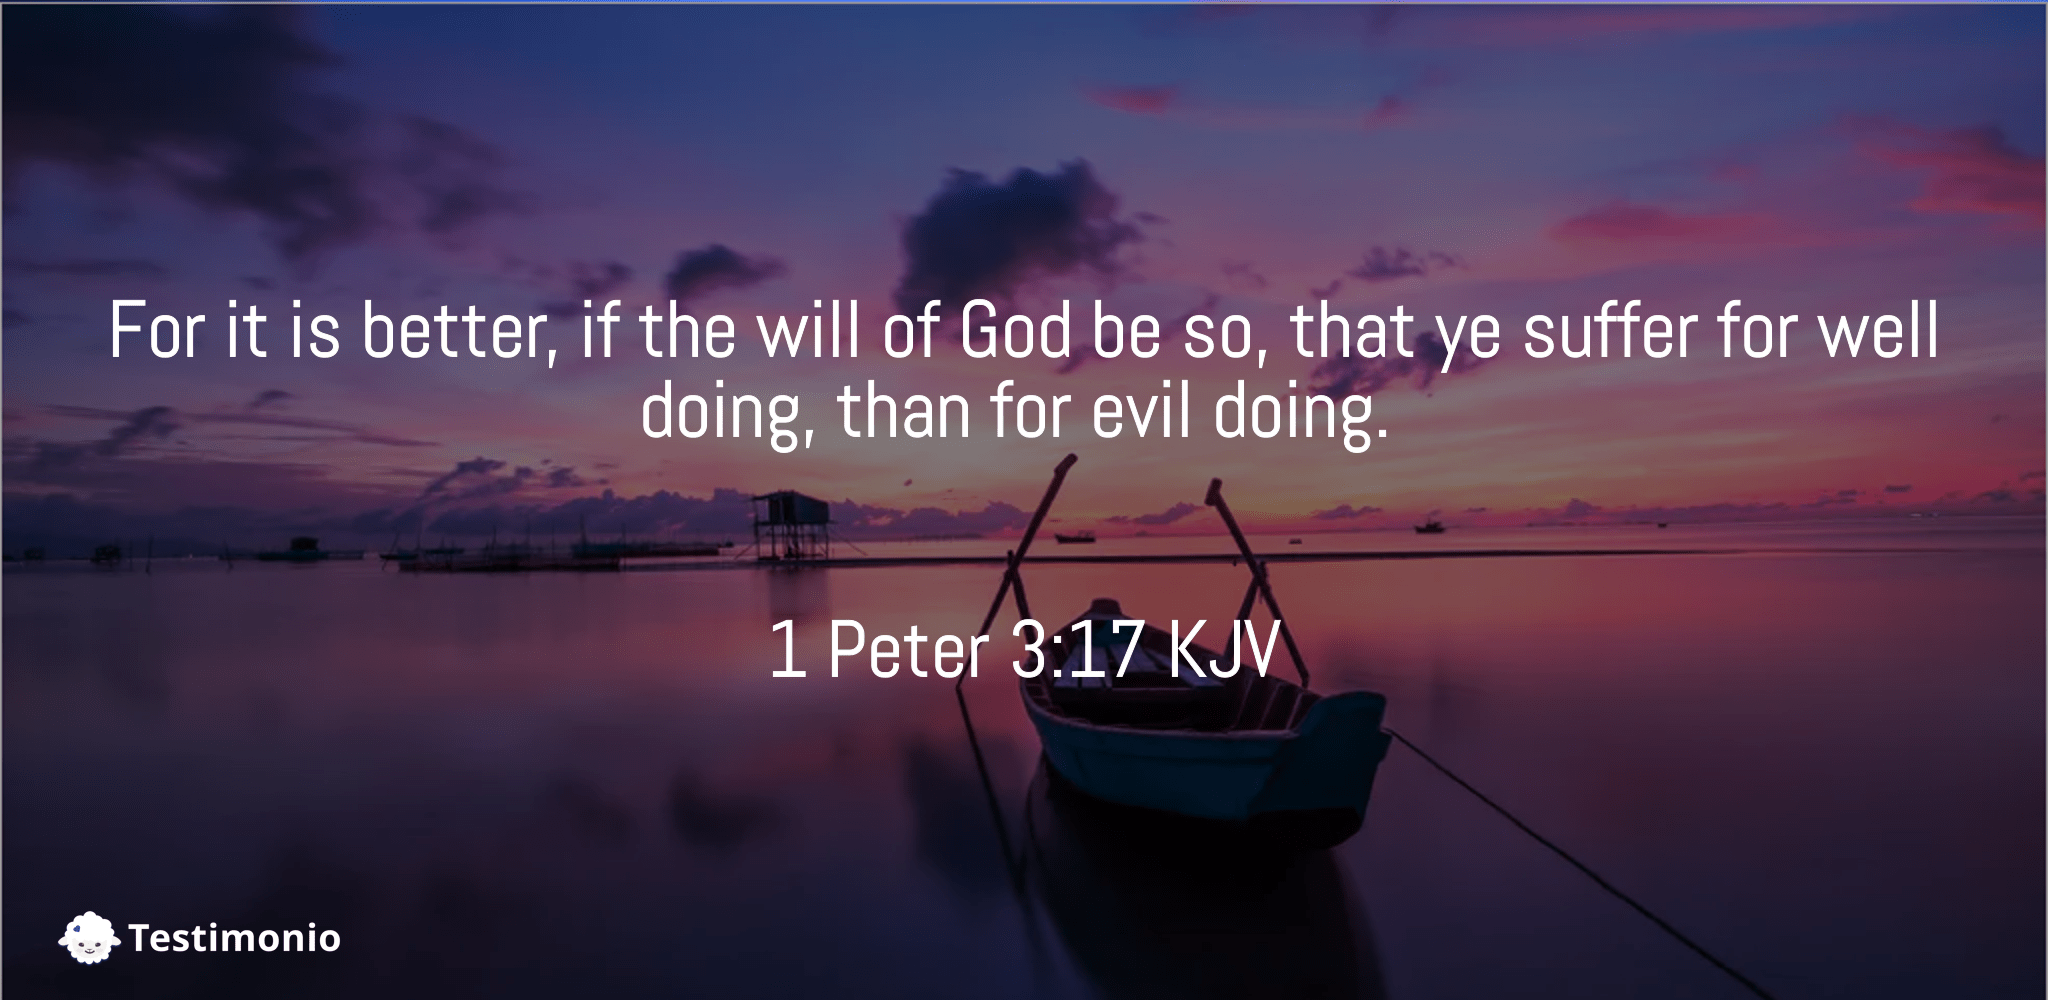 1 Peter 3:17